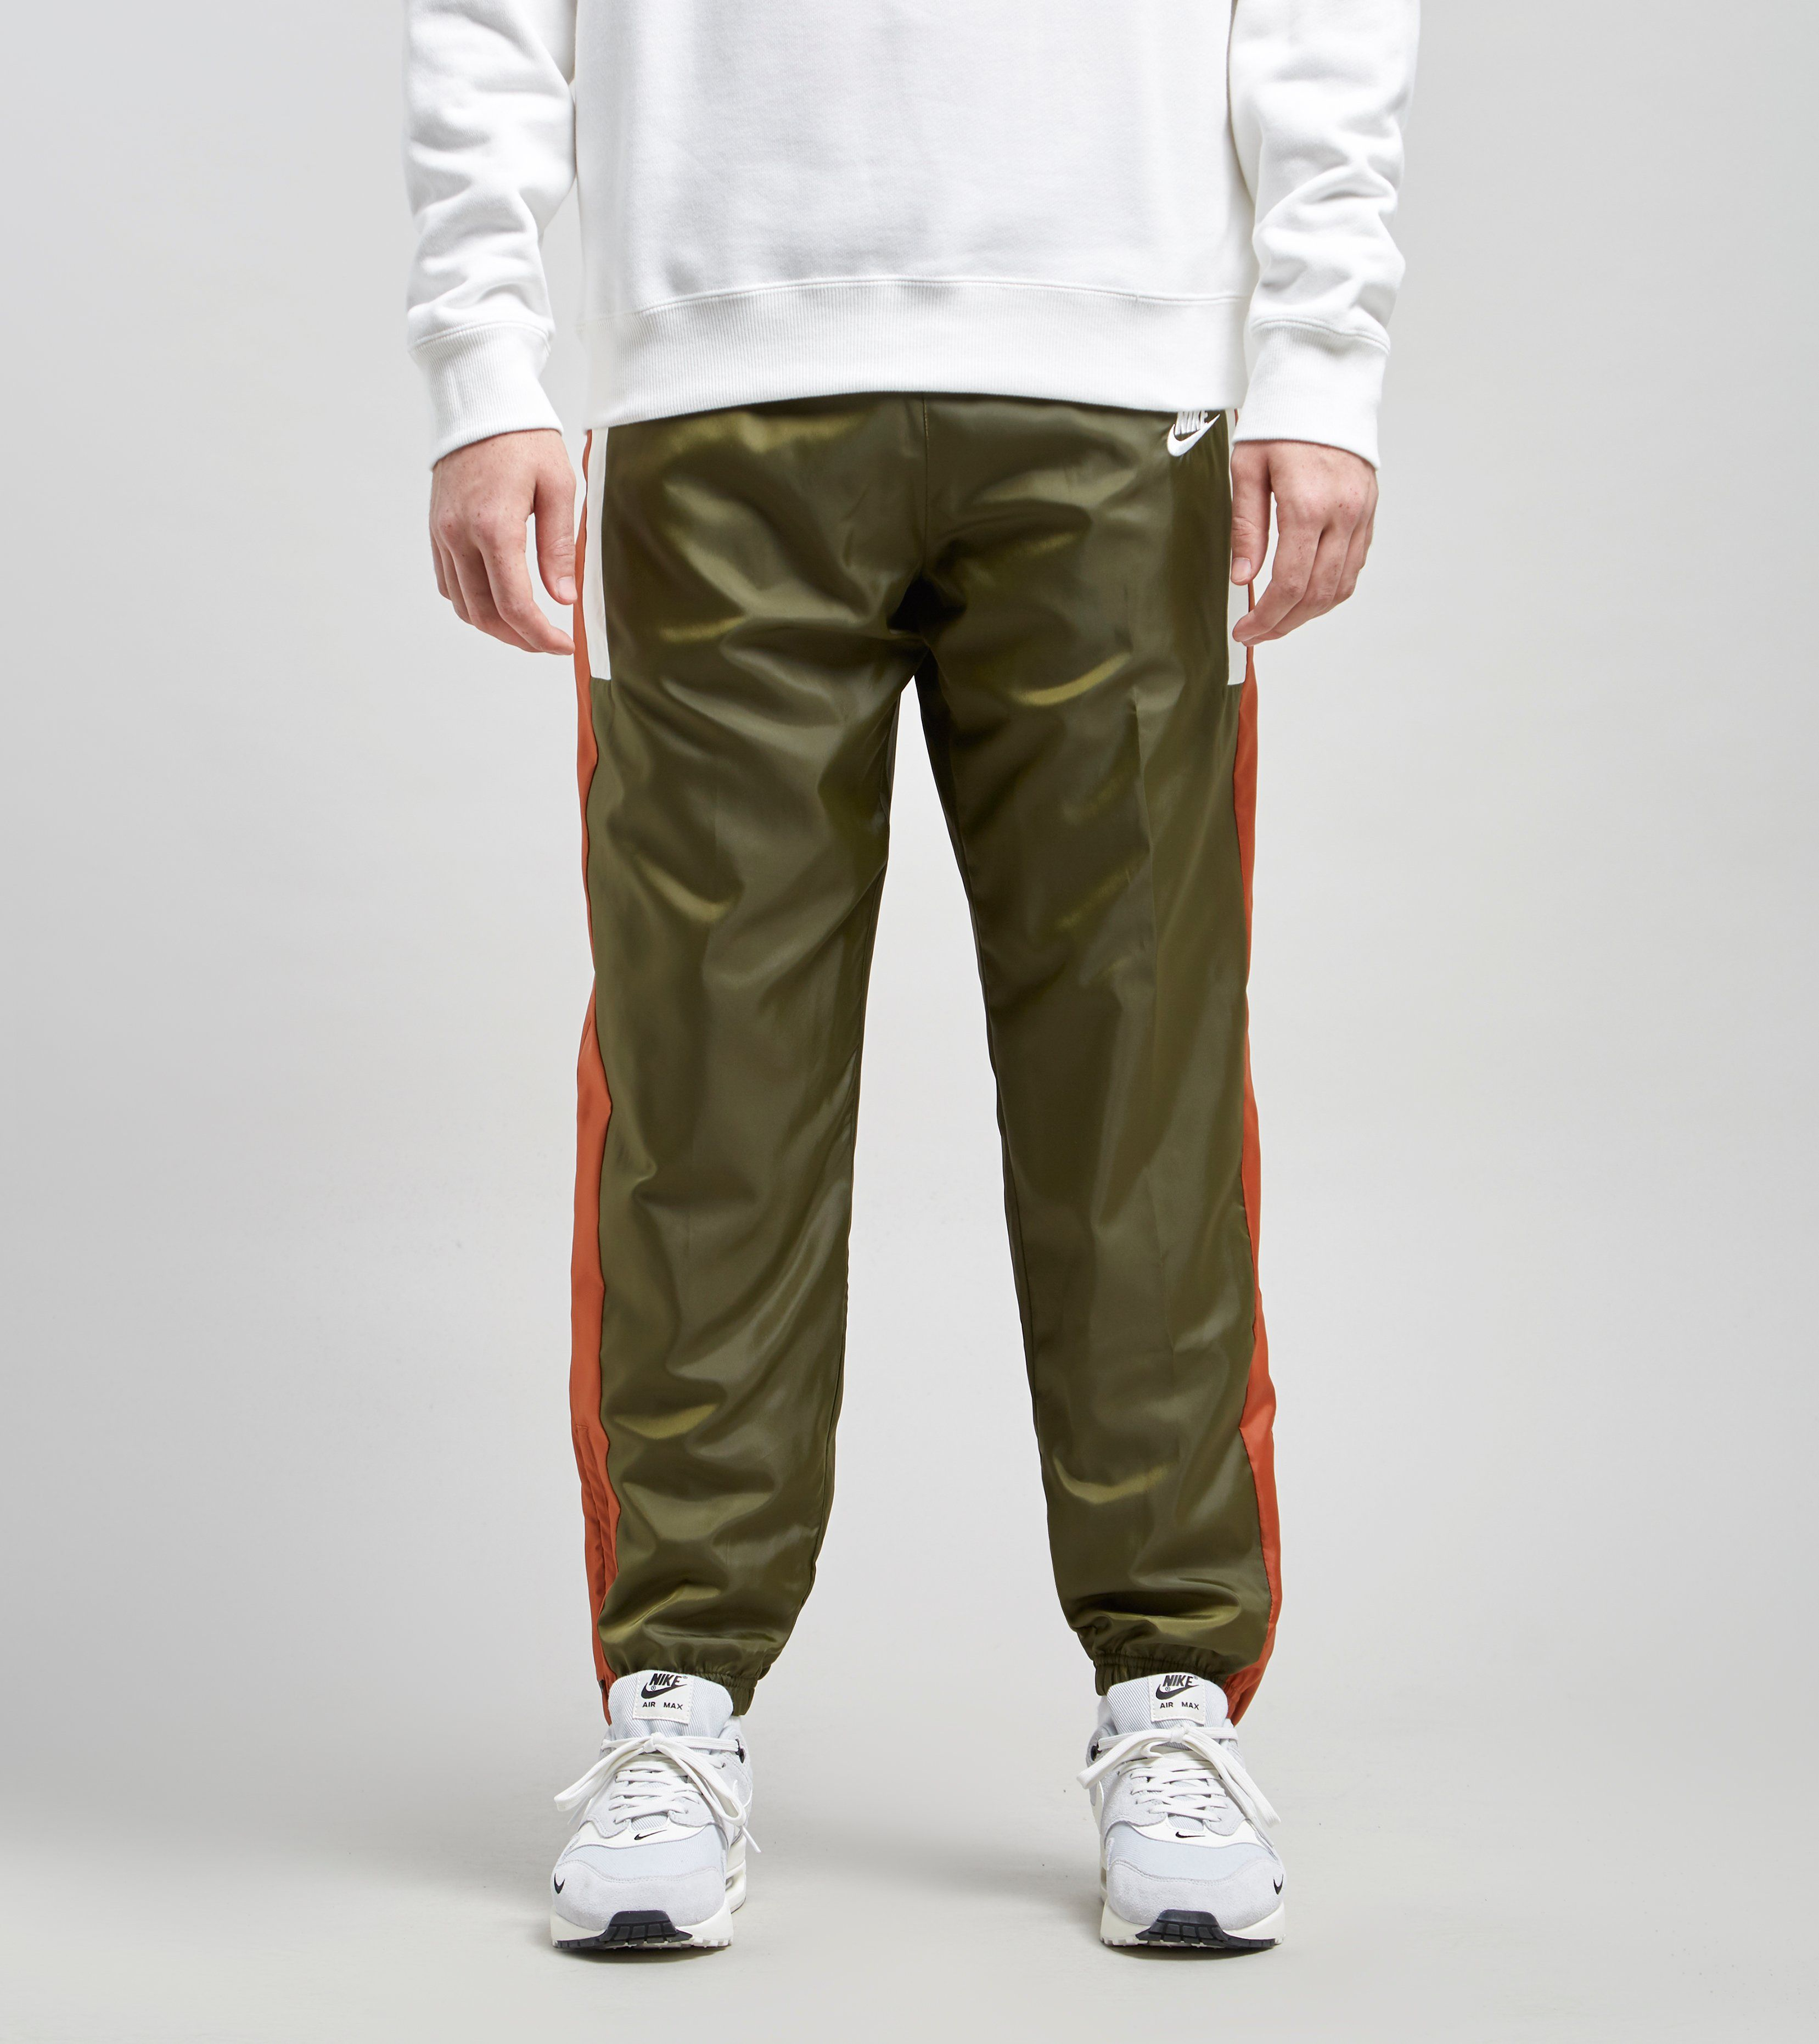 Nike Reissue Woven Pant